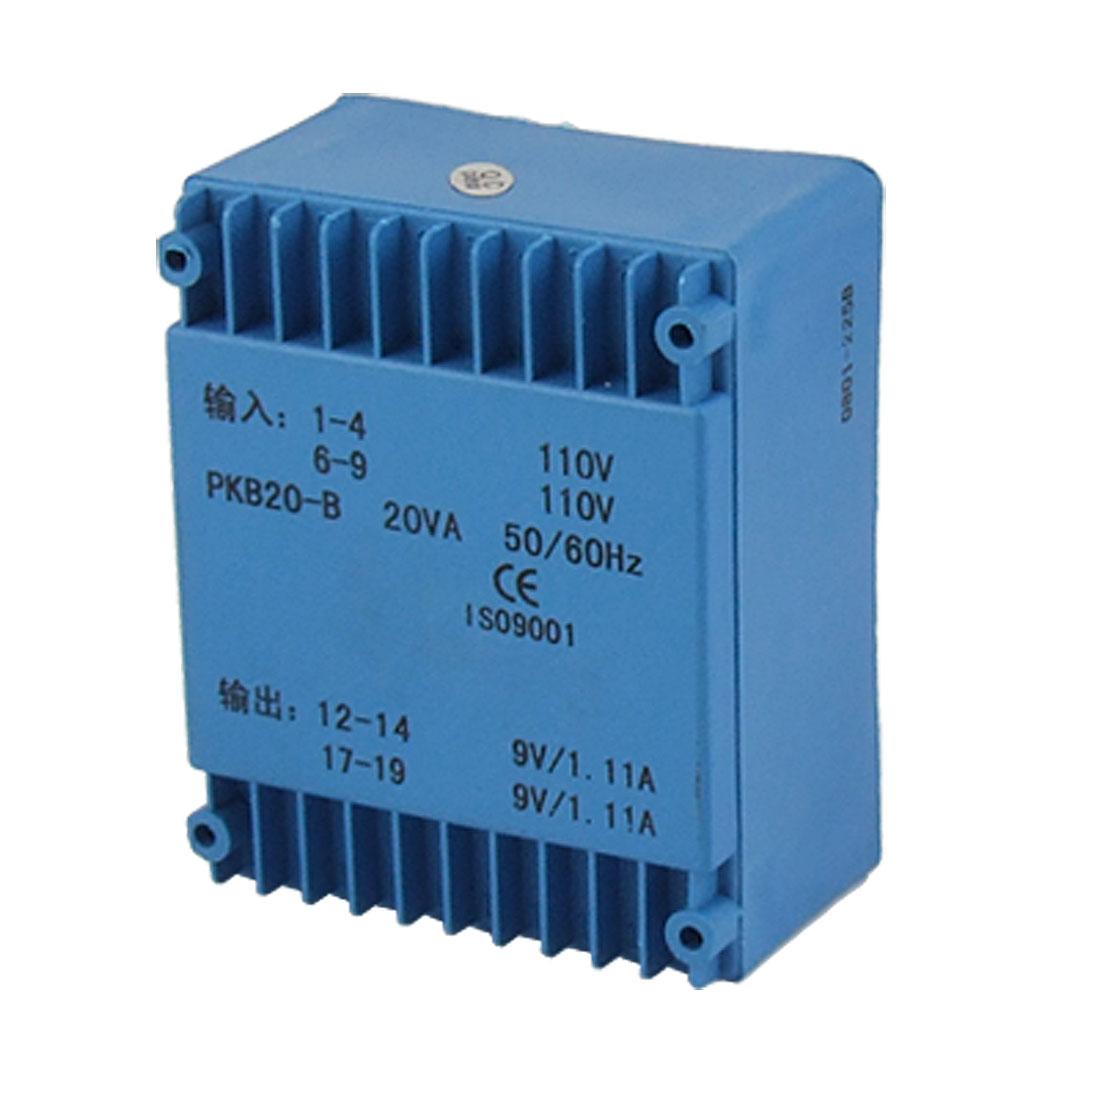 20VA Double Way Output Epoxy Resin Sealed Encapsulated Transformer 110V